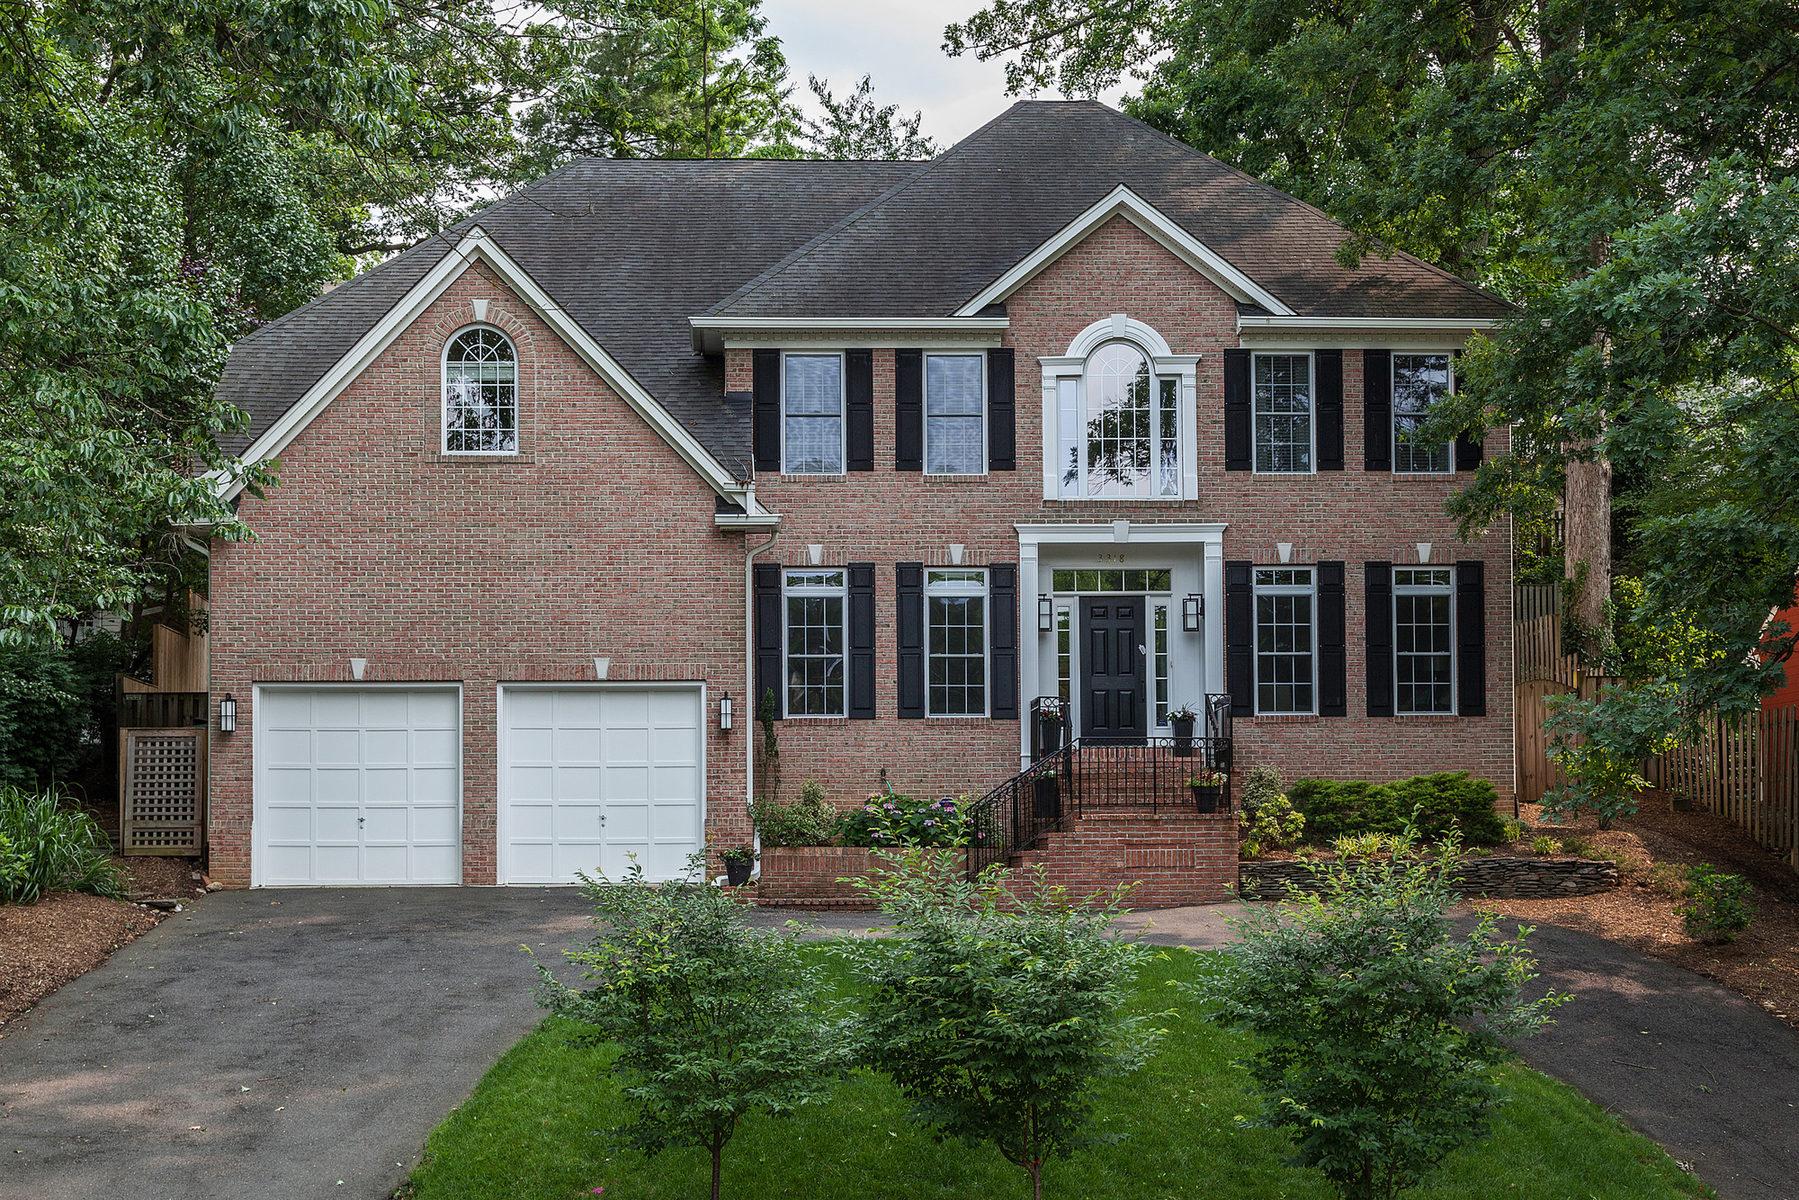 Single Family Home for Sale at 3318 Lorcom Lane, Arlington 3318 Lorcom Ln Arlington, Virginia 22207 United States